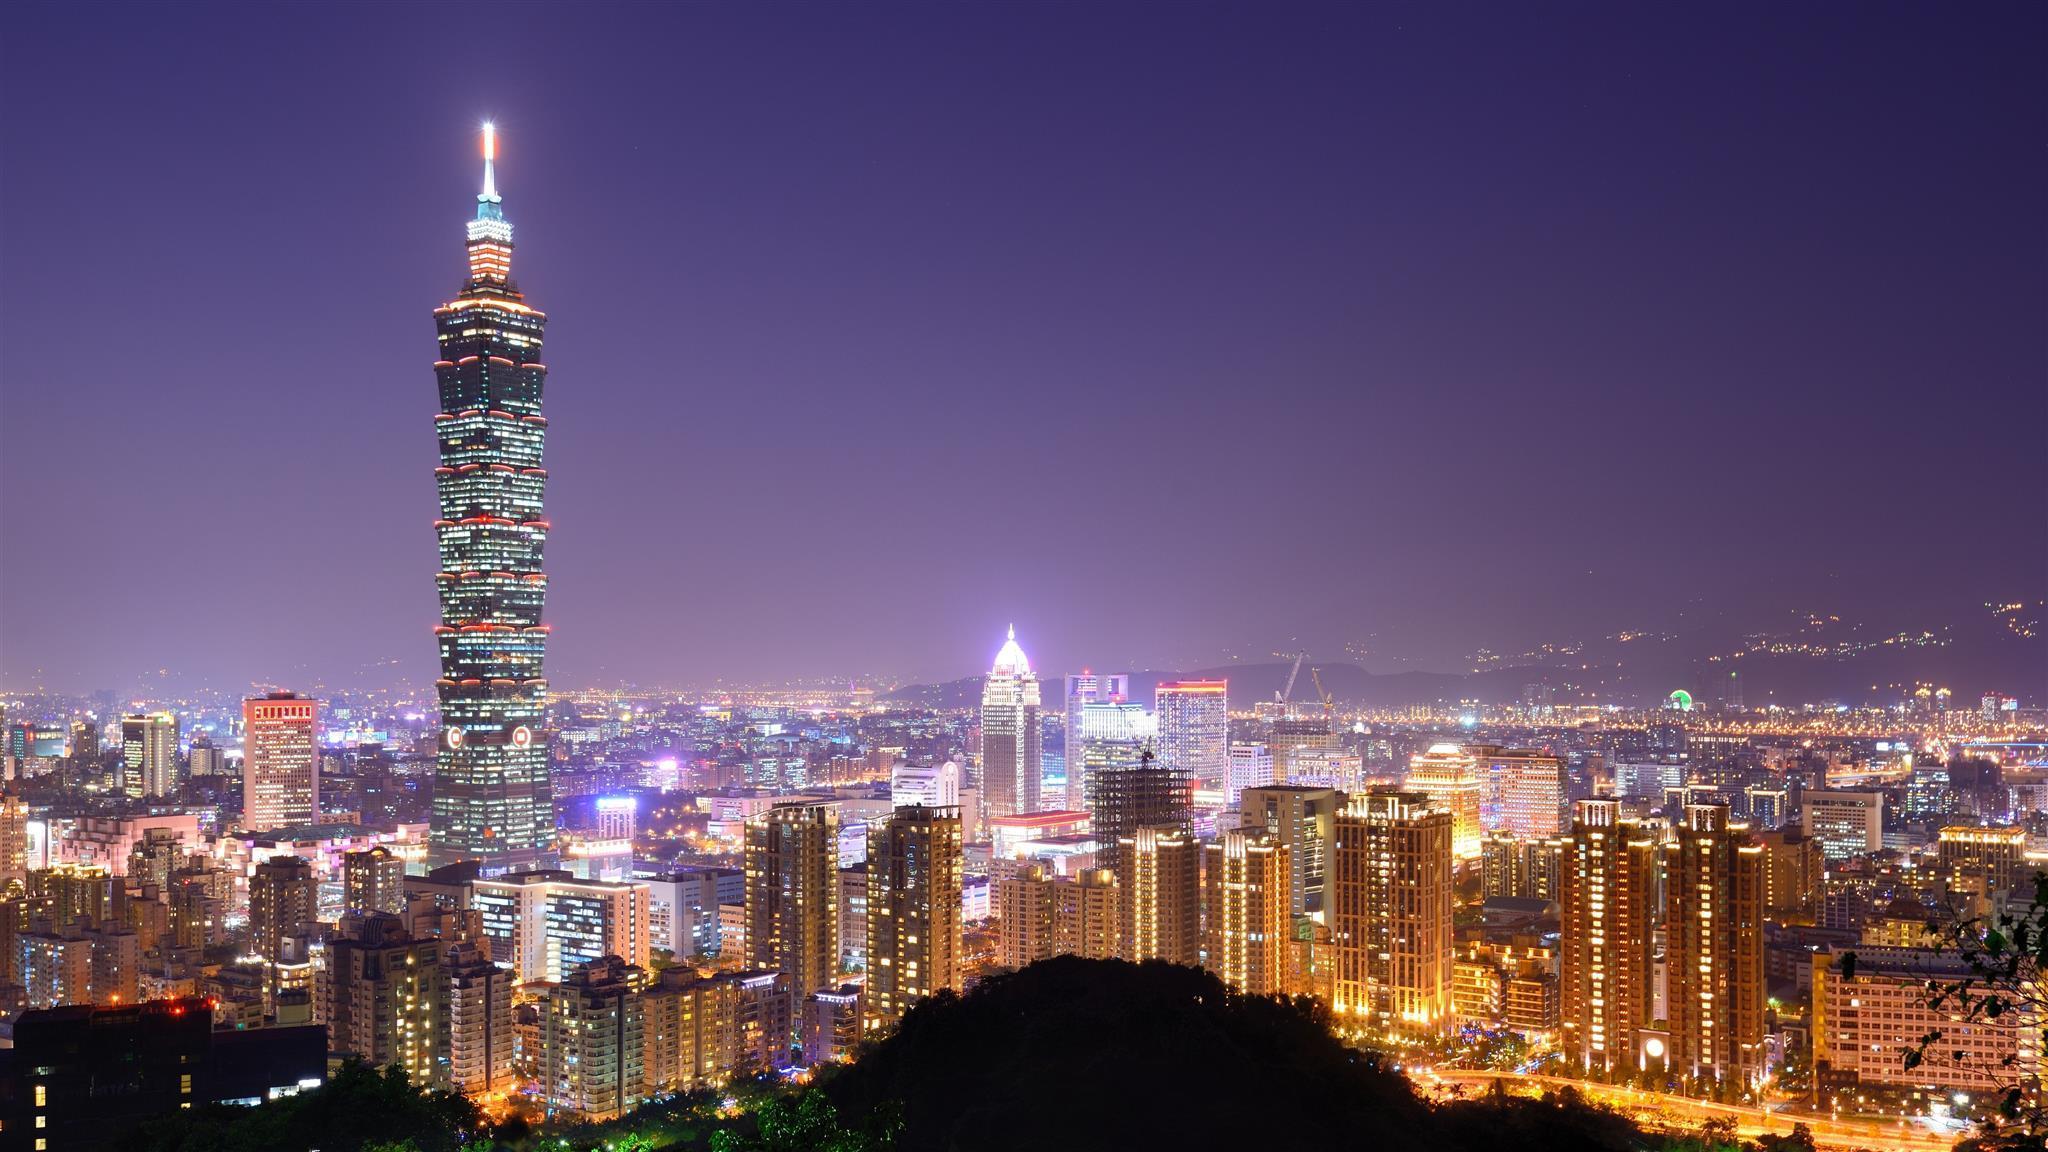 Taipei speed dating hook up bars in Vegas